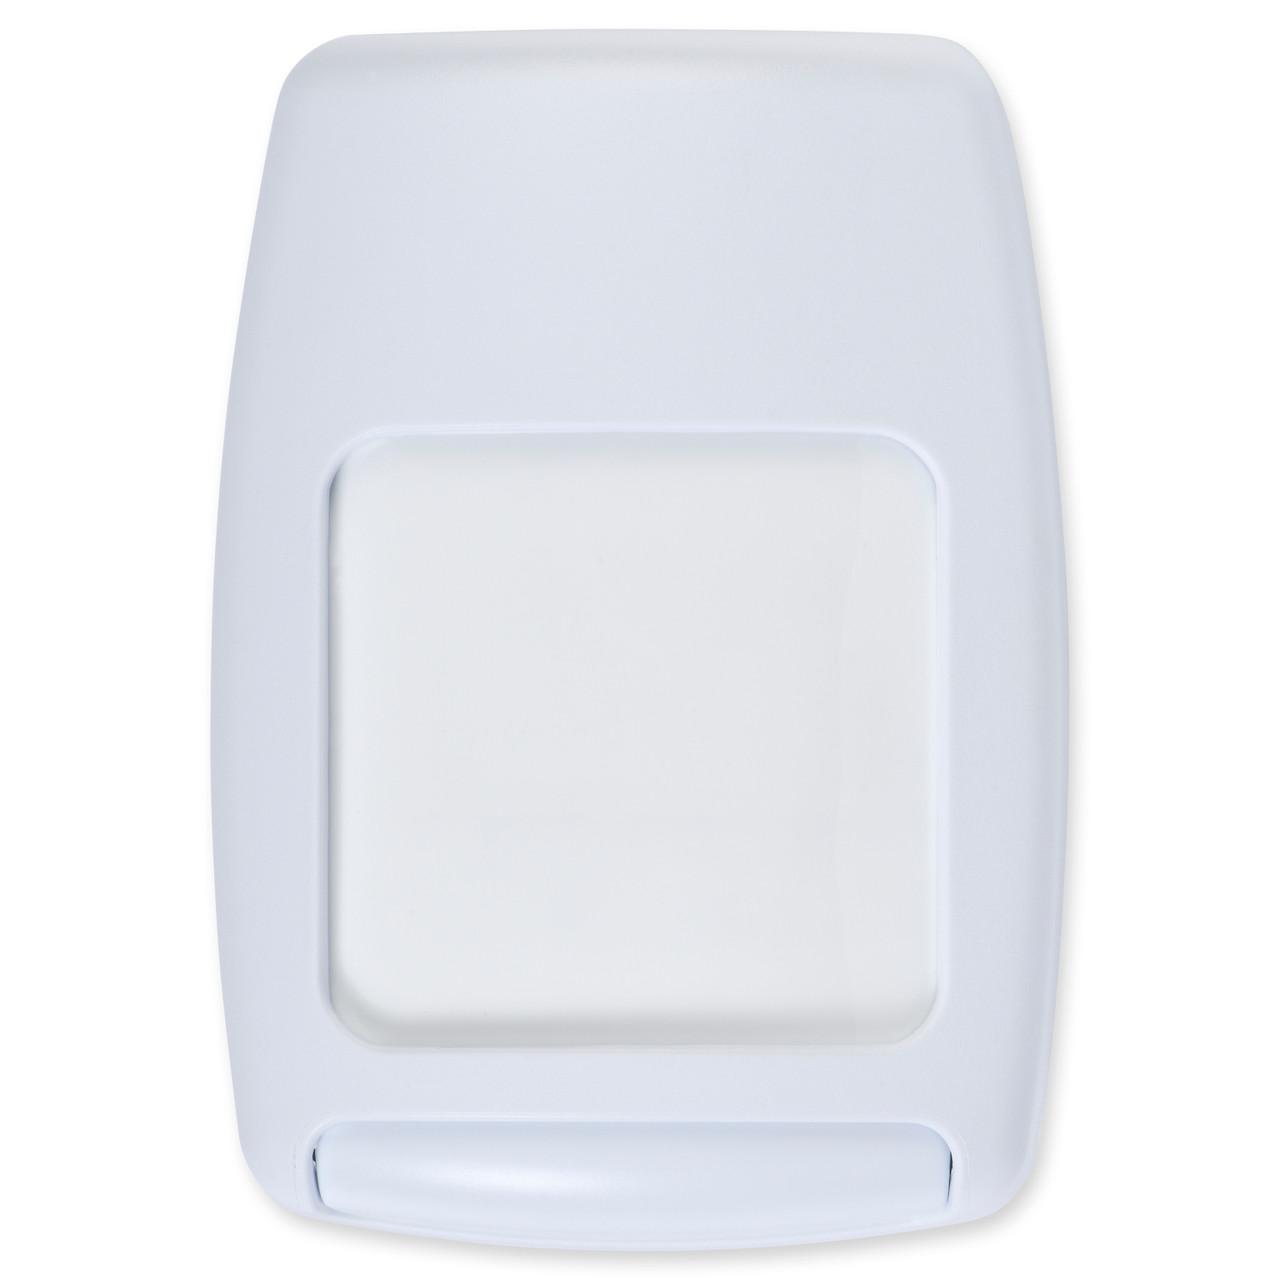 Honeywell 5800PIR-RES Wireless Passive Infrared Motion Sensor